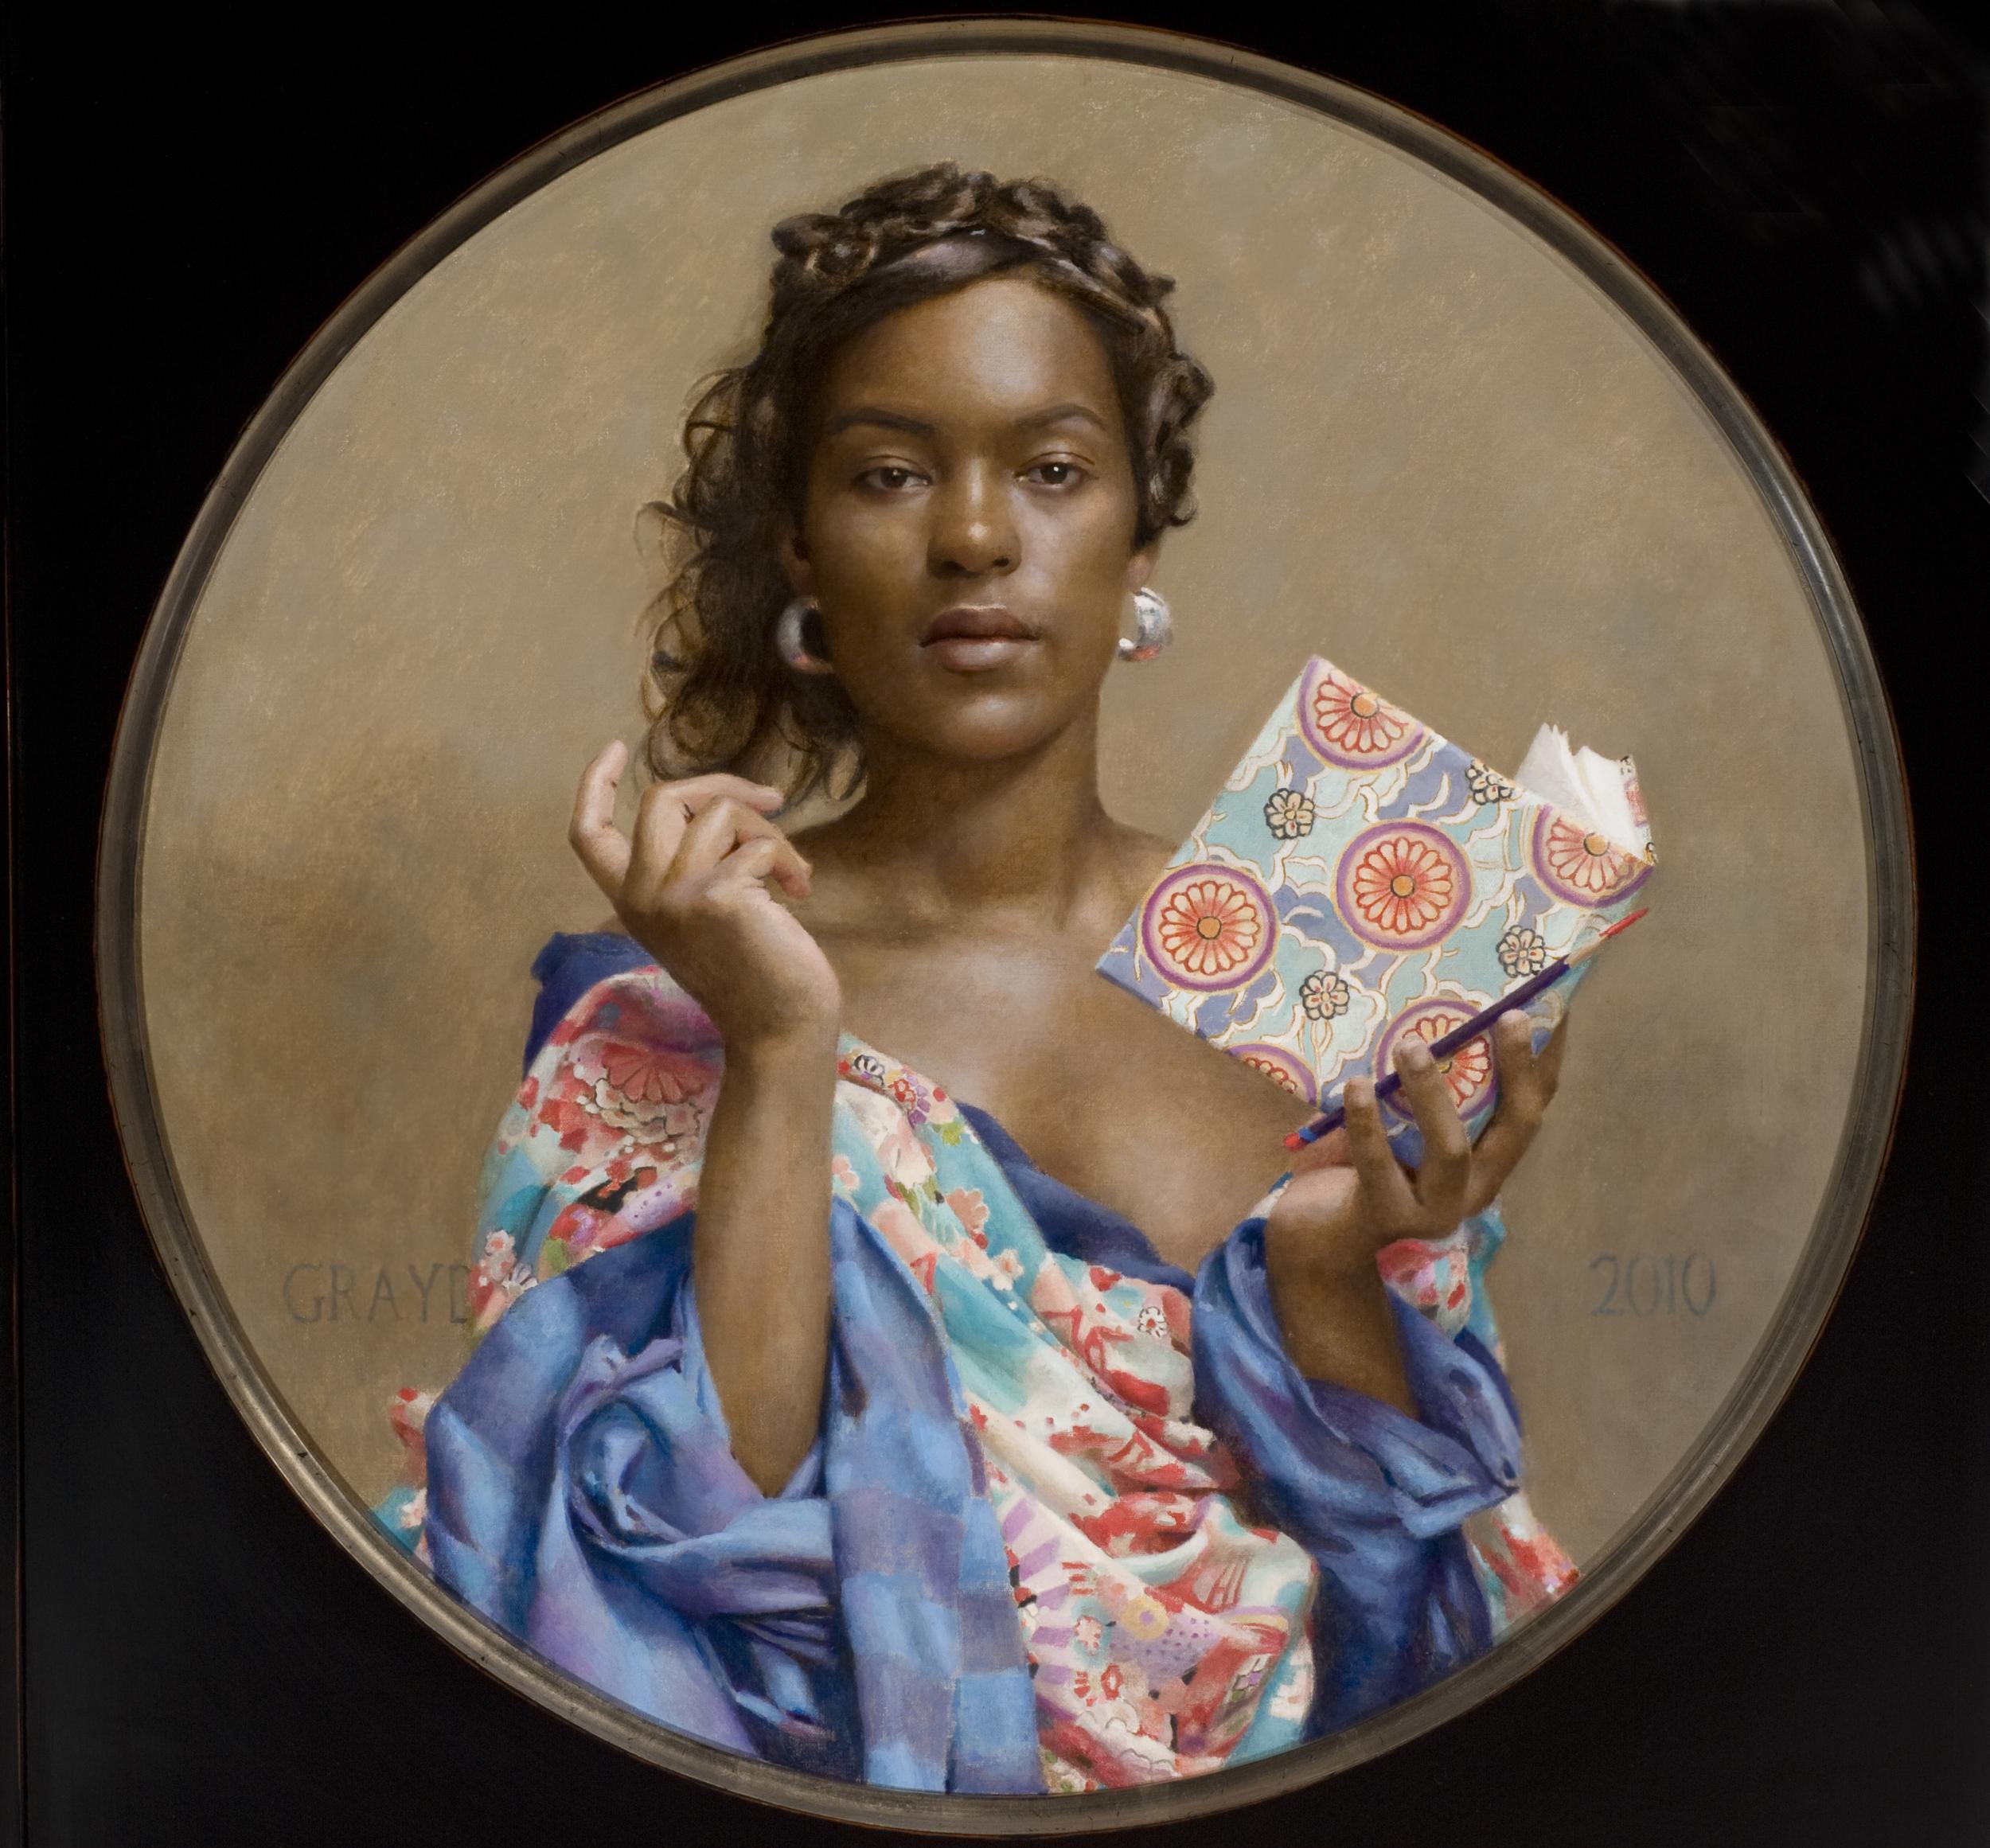 The American Sappho by Graydon Parrish